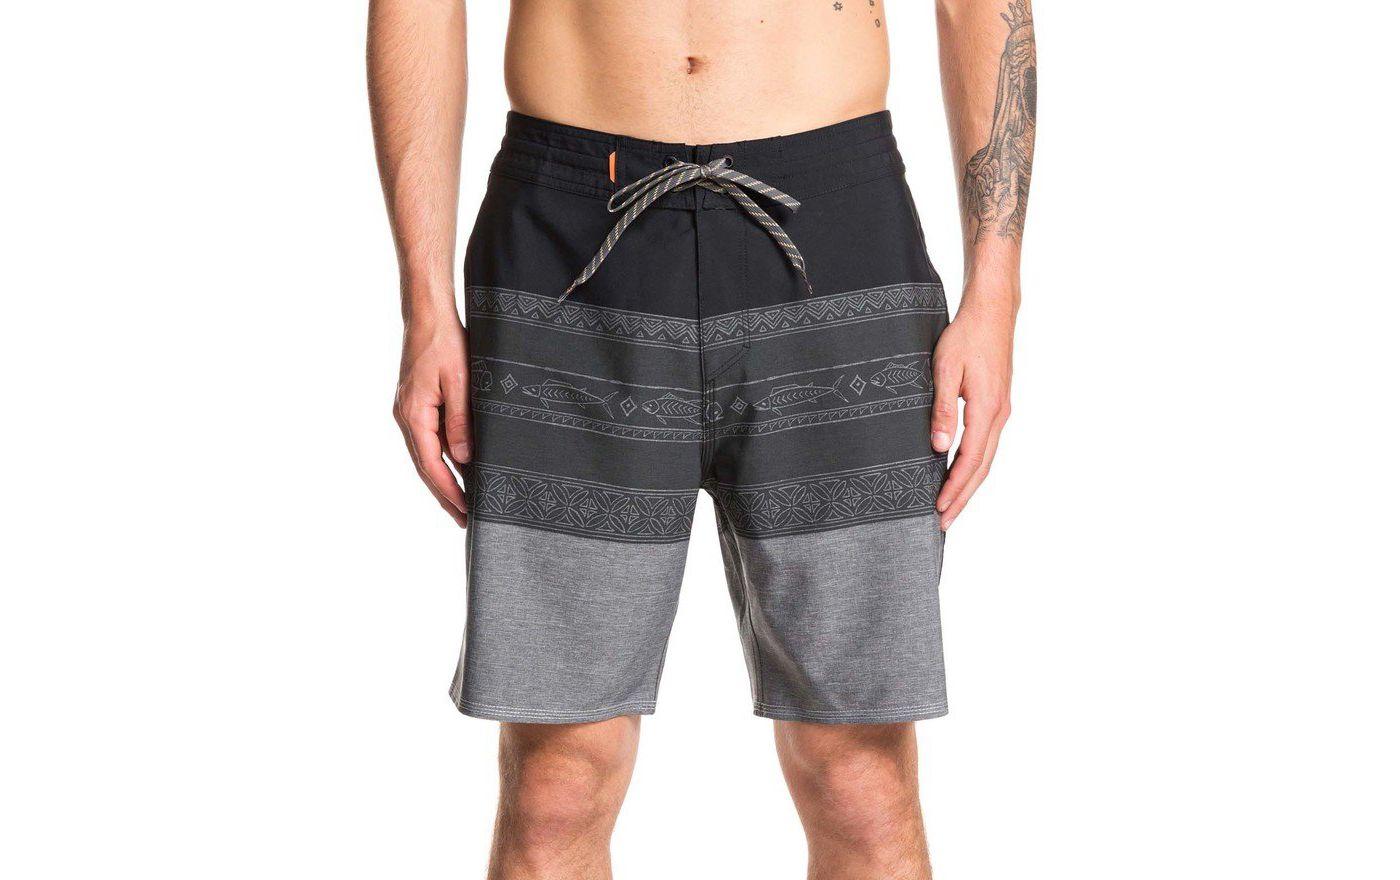 Quiksilver Men's Waterman Liberty Triblock Board Shorts (Regular and Big & Tall)